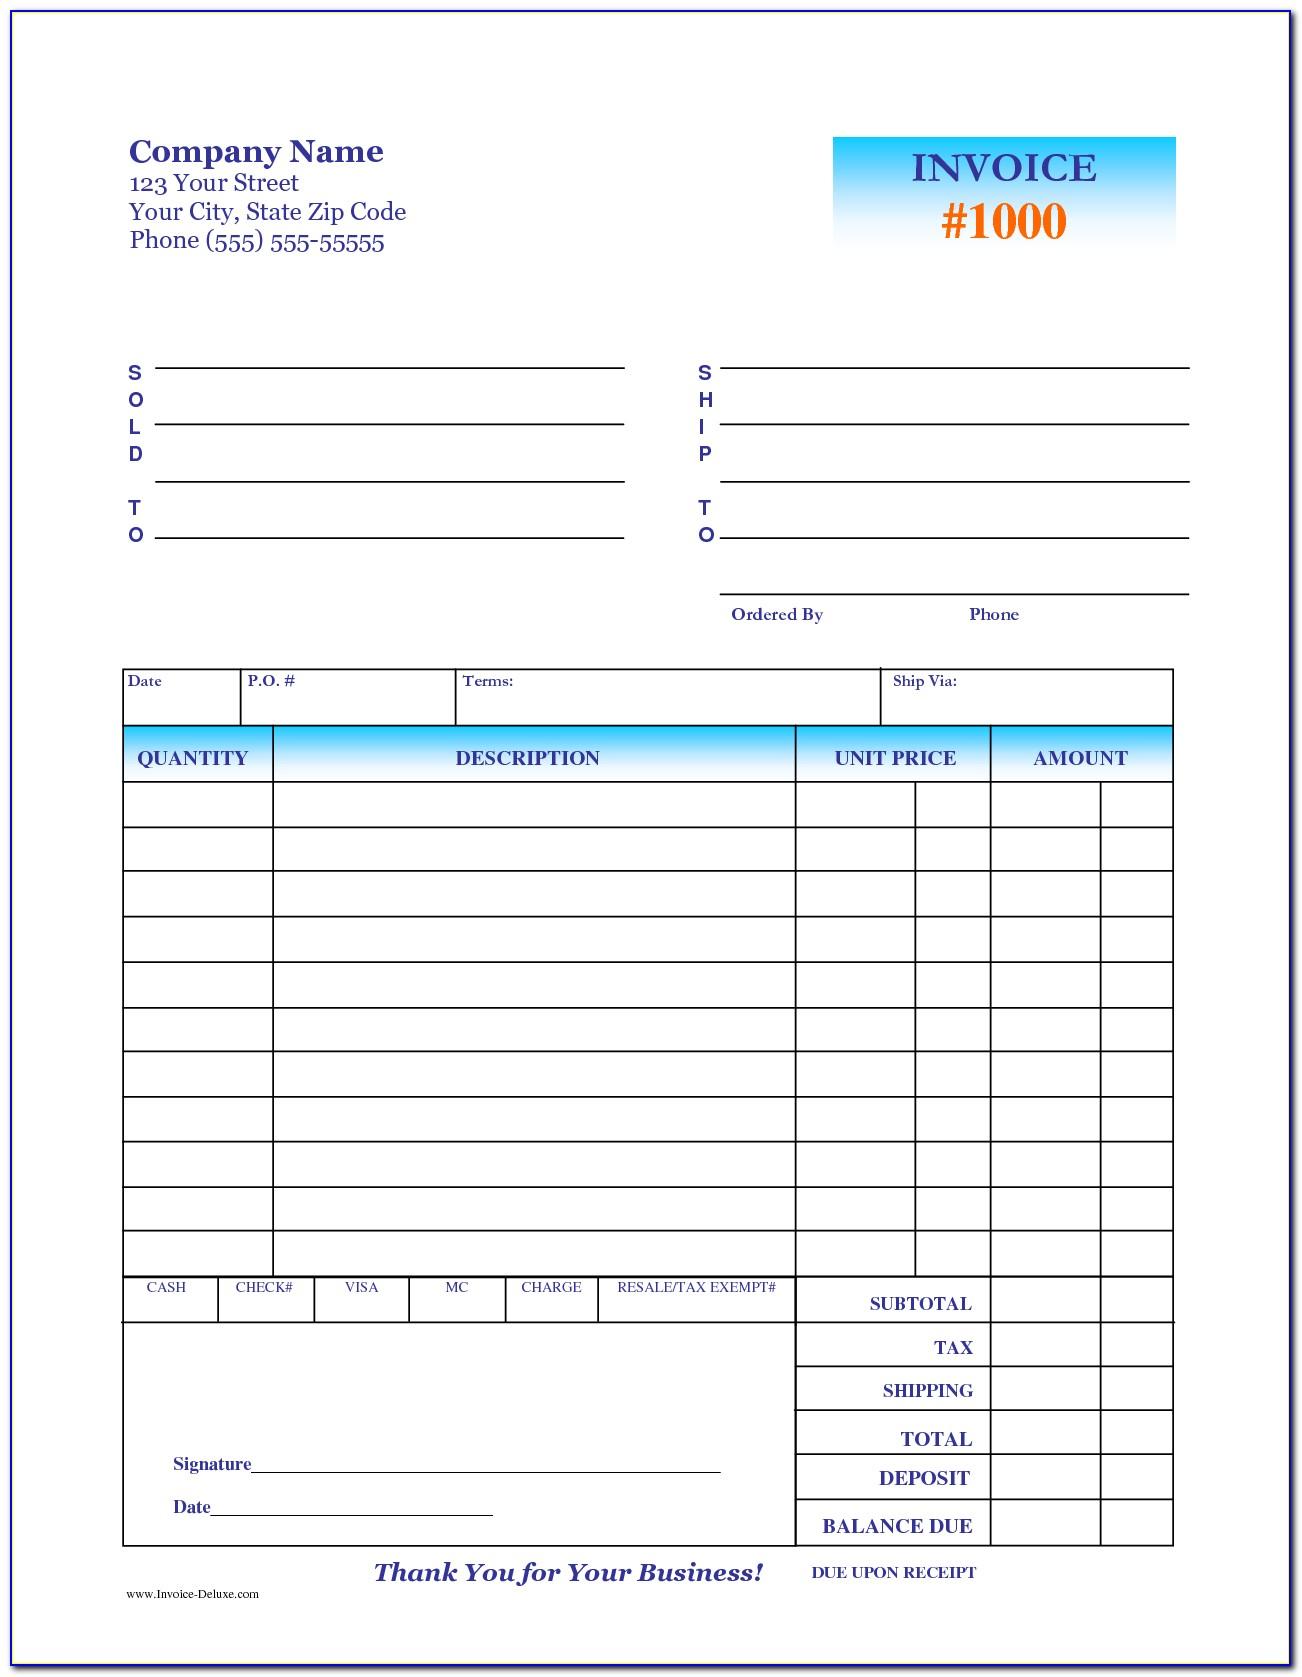 50 Deposit Invoice Template